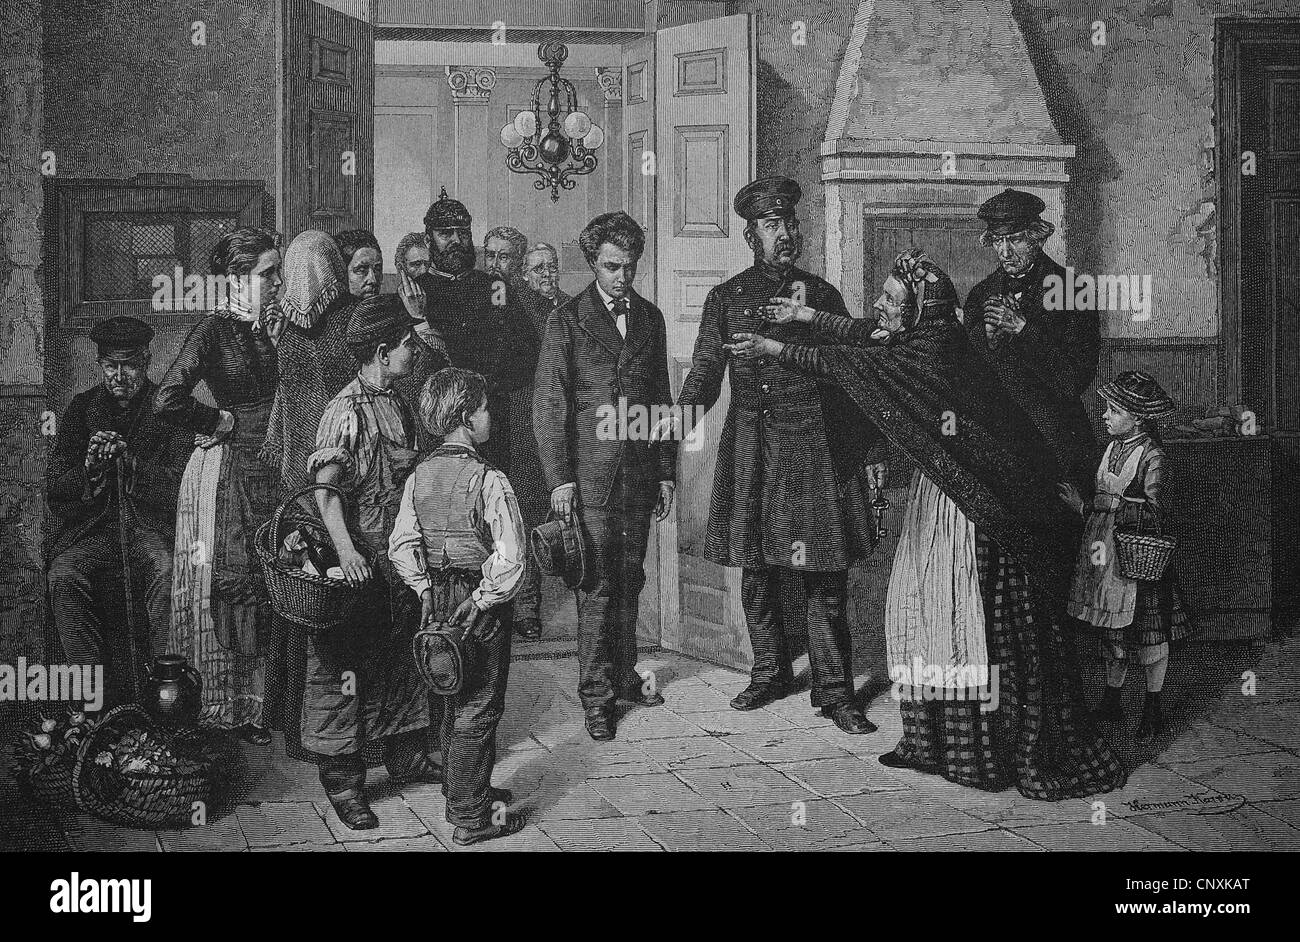 Verbrecher gefangen, historische Gravuren, 1883 Stockbild